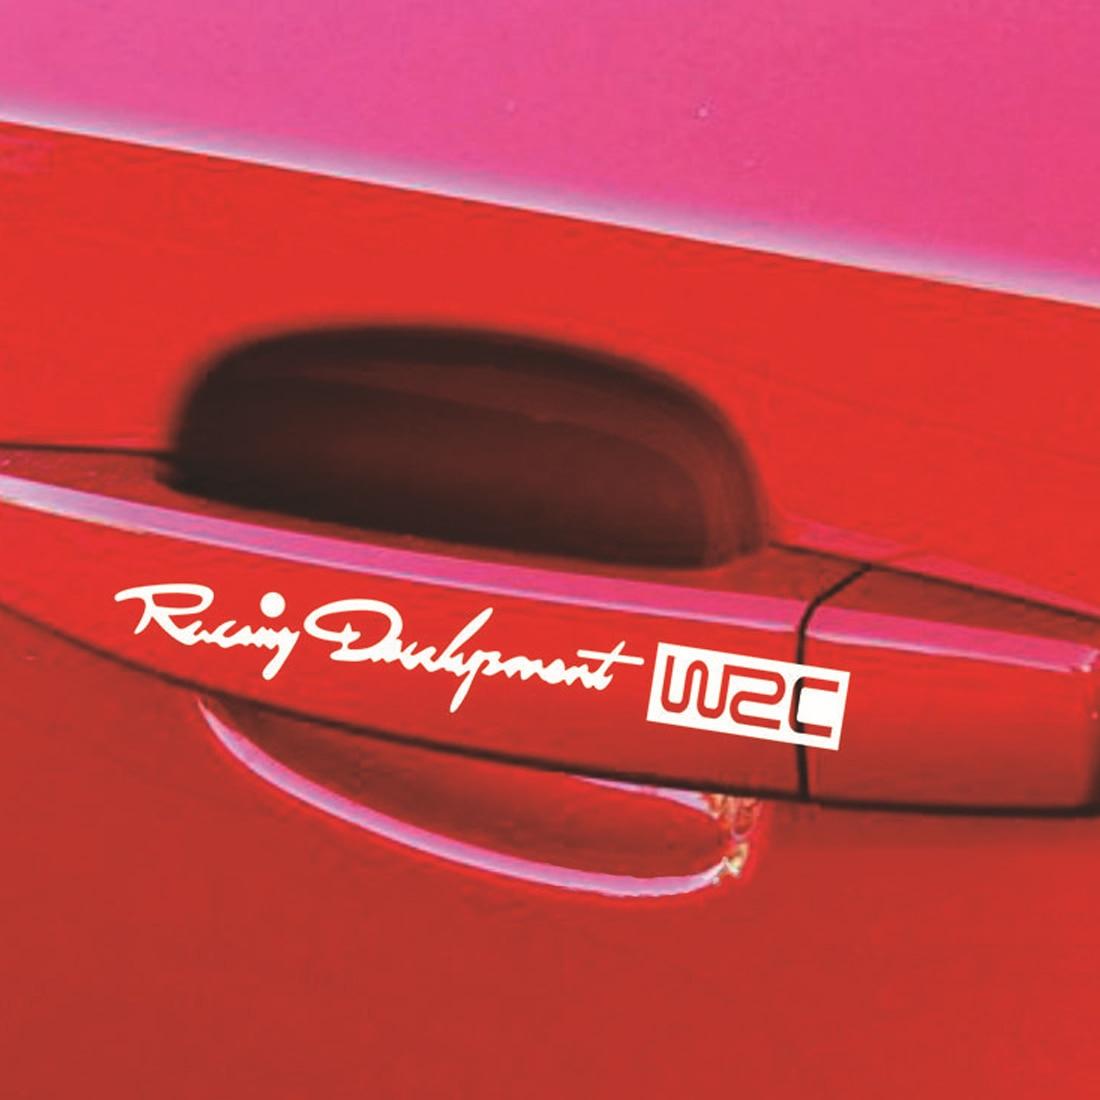 NEW Door Handle White /& Red Car Body Sticker Racing Development TRD  Set 4 Pcs